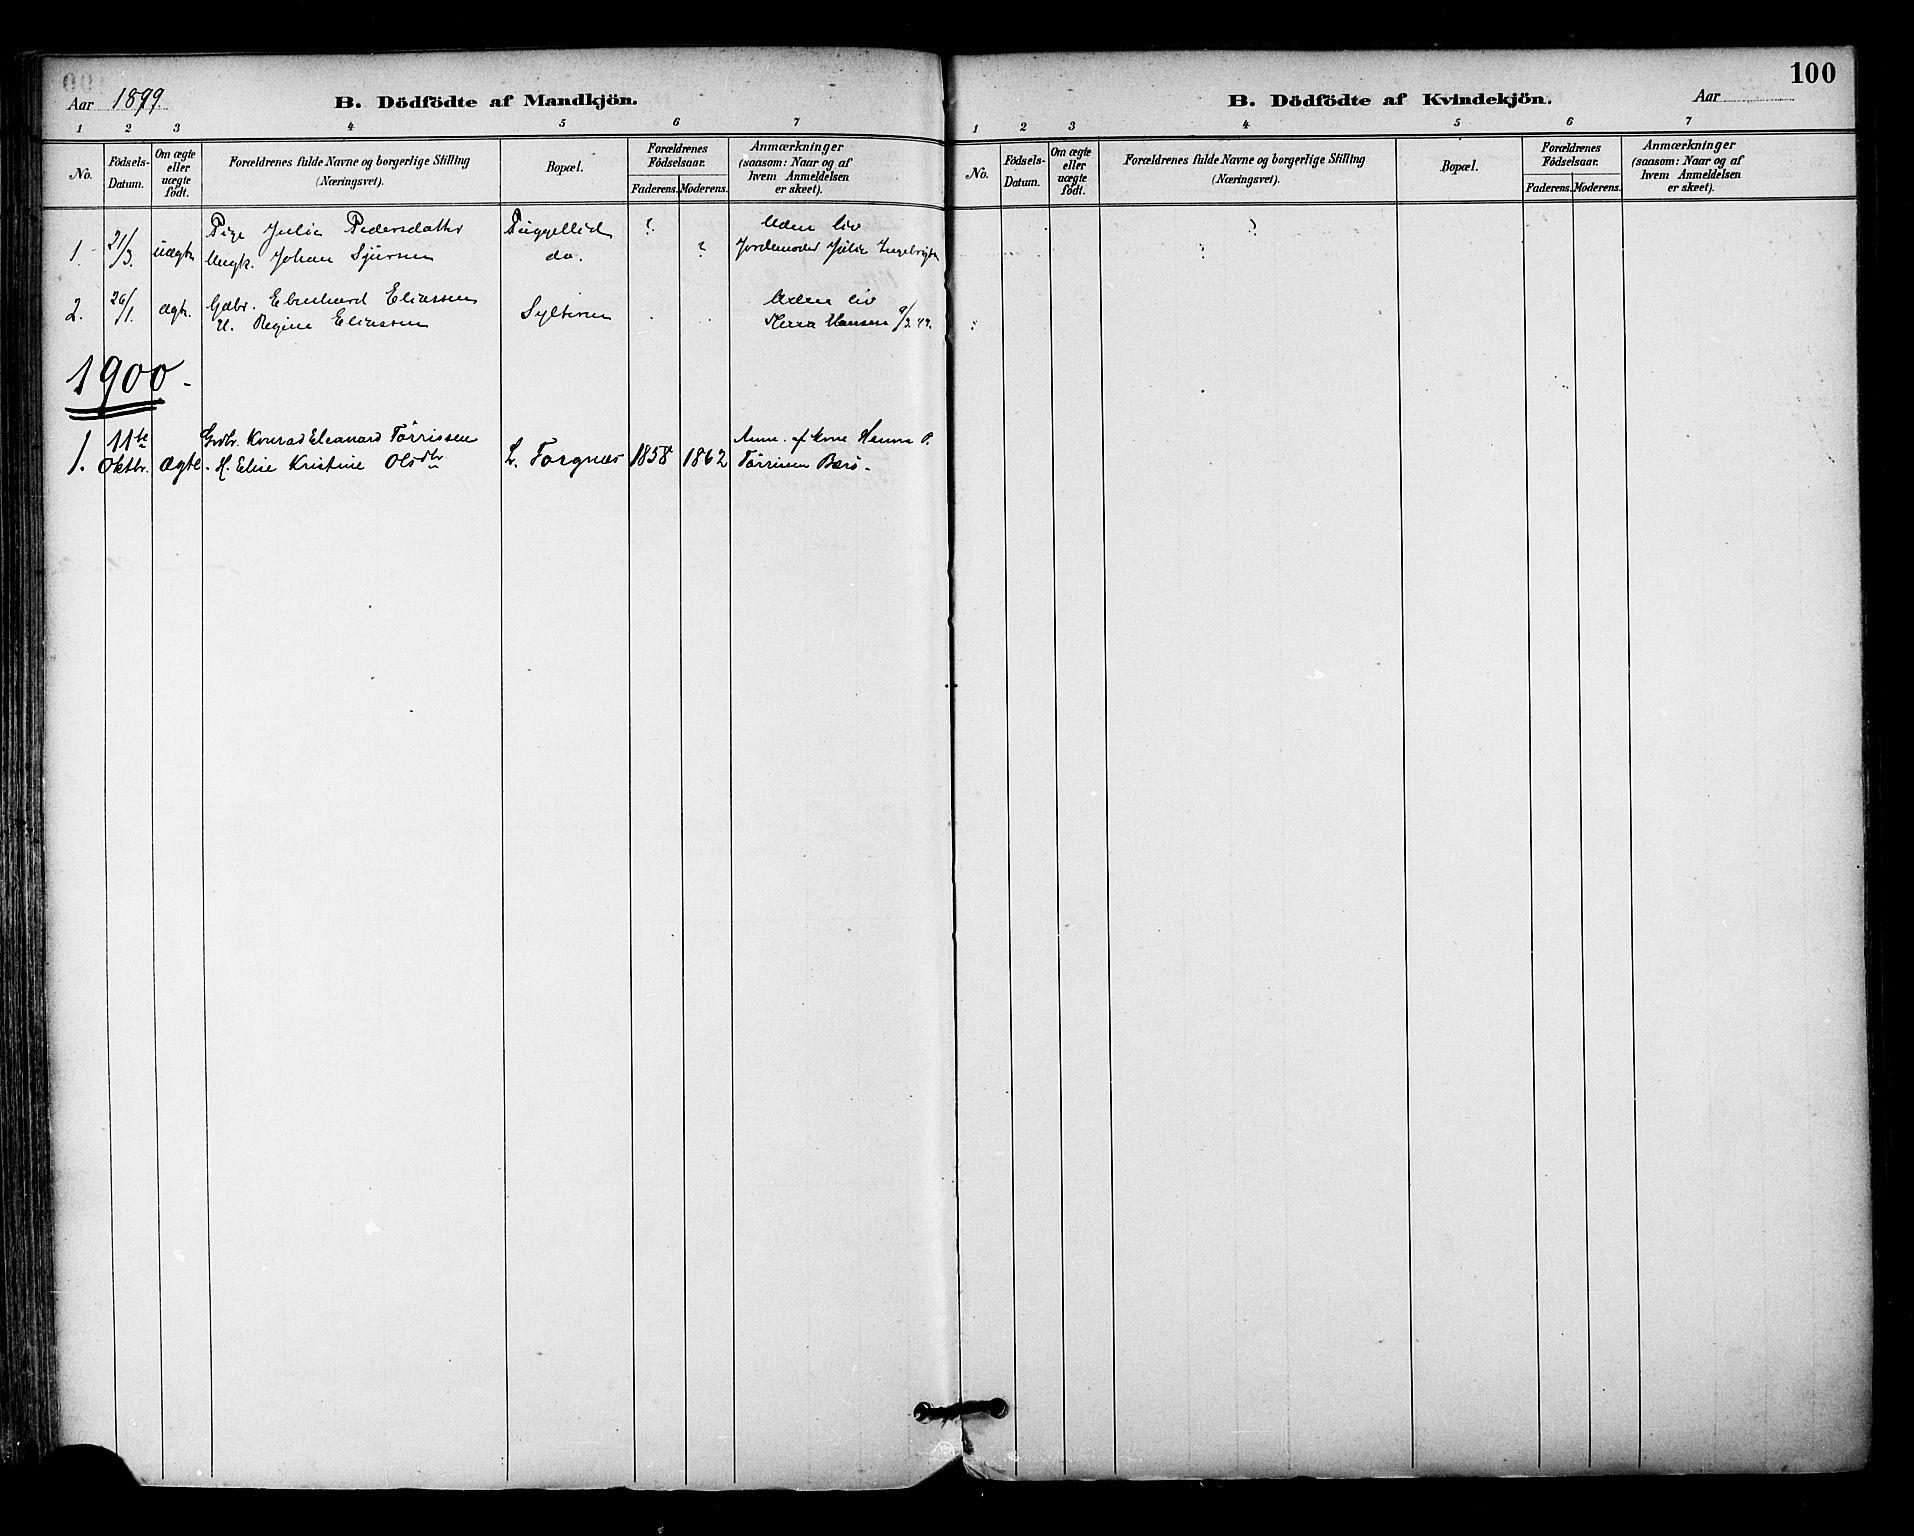 SAT, Ministerialprotokoller, klokkerbøker og fødselsregistre - Nordland, 813/L0200: Ministerialbok nr. 813A10, 1886-1900, s. 100